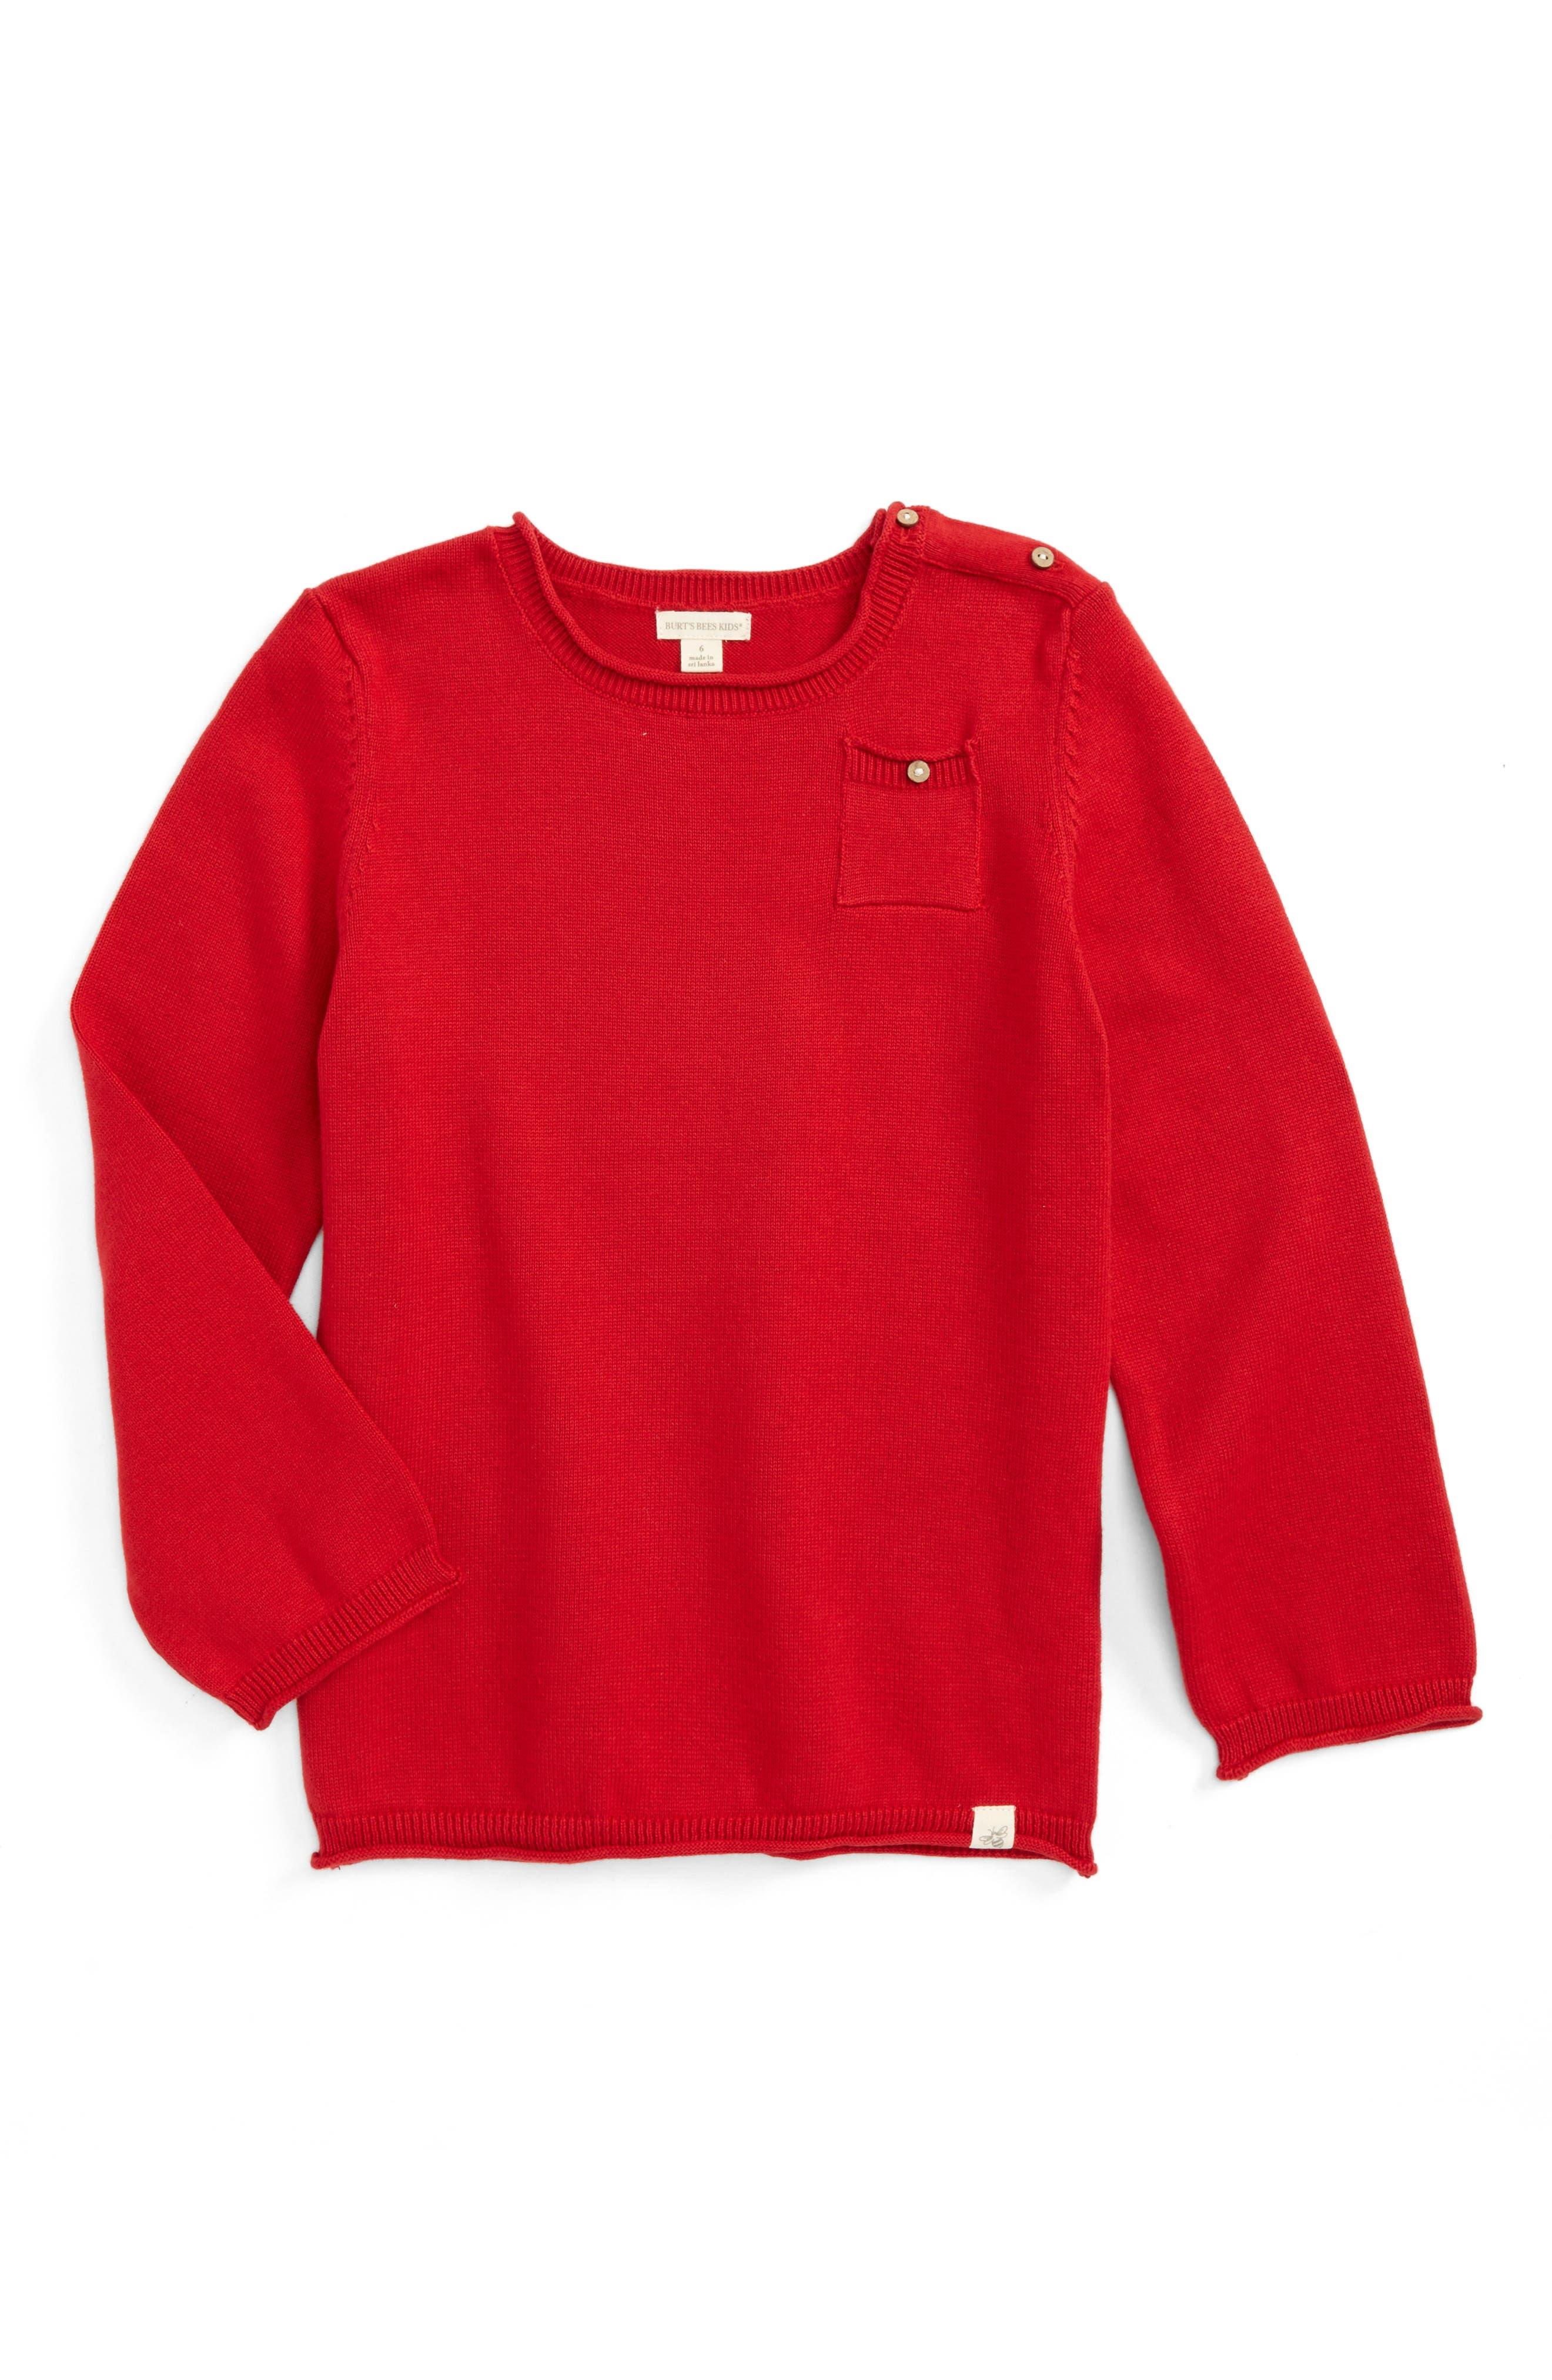 Burt's Bees Baby Pocket Organic Cotton Sweater (Toddler Boys & Big Boys)